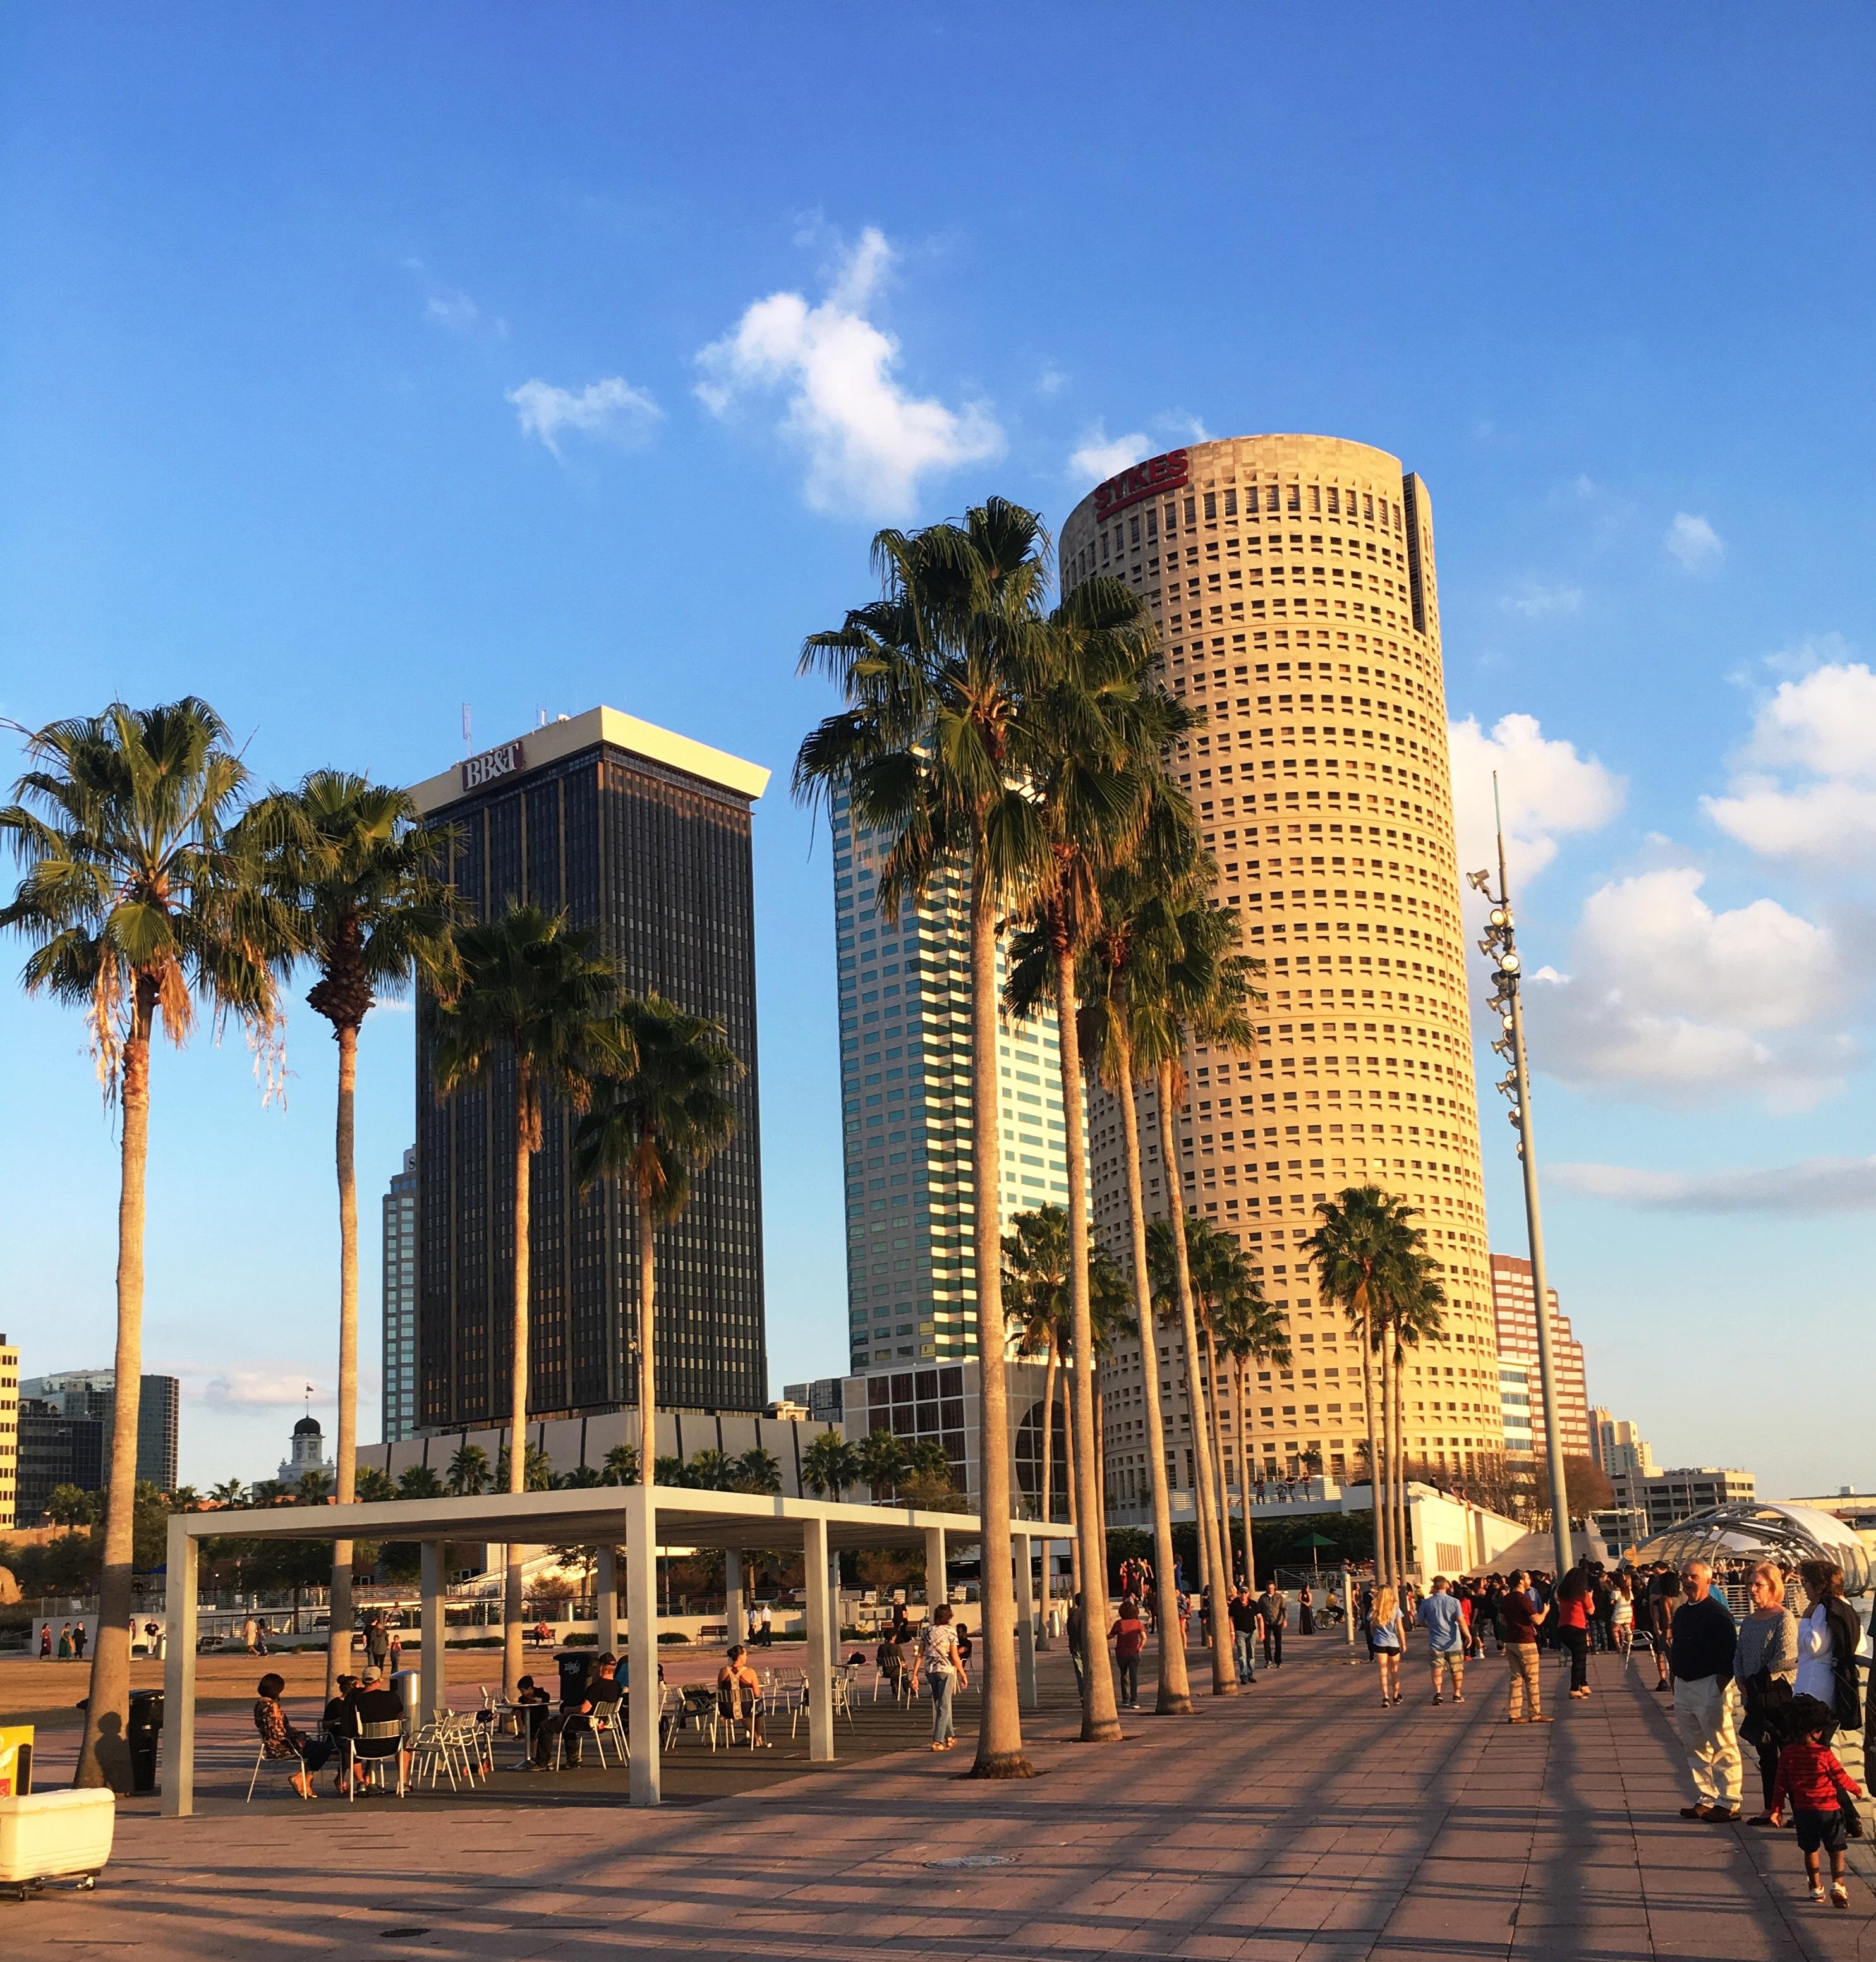 Tampa bay, florida, riverwalk, boardwalk,